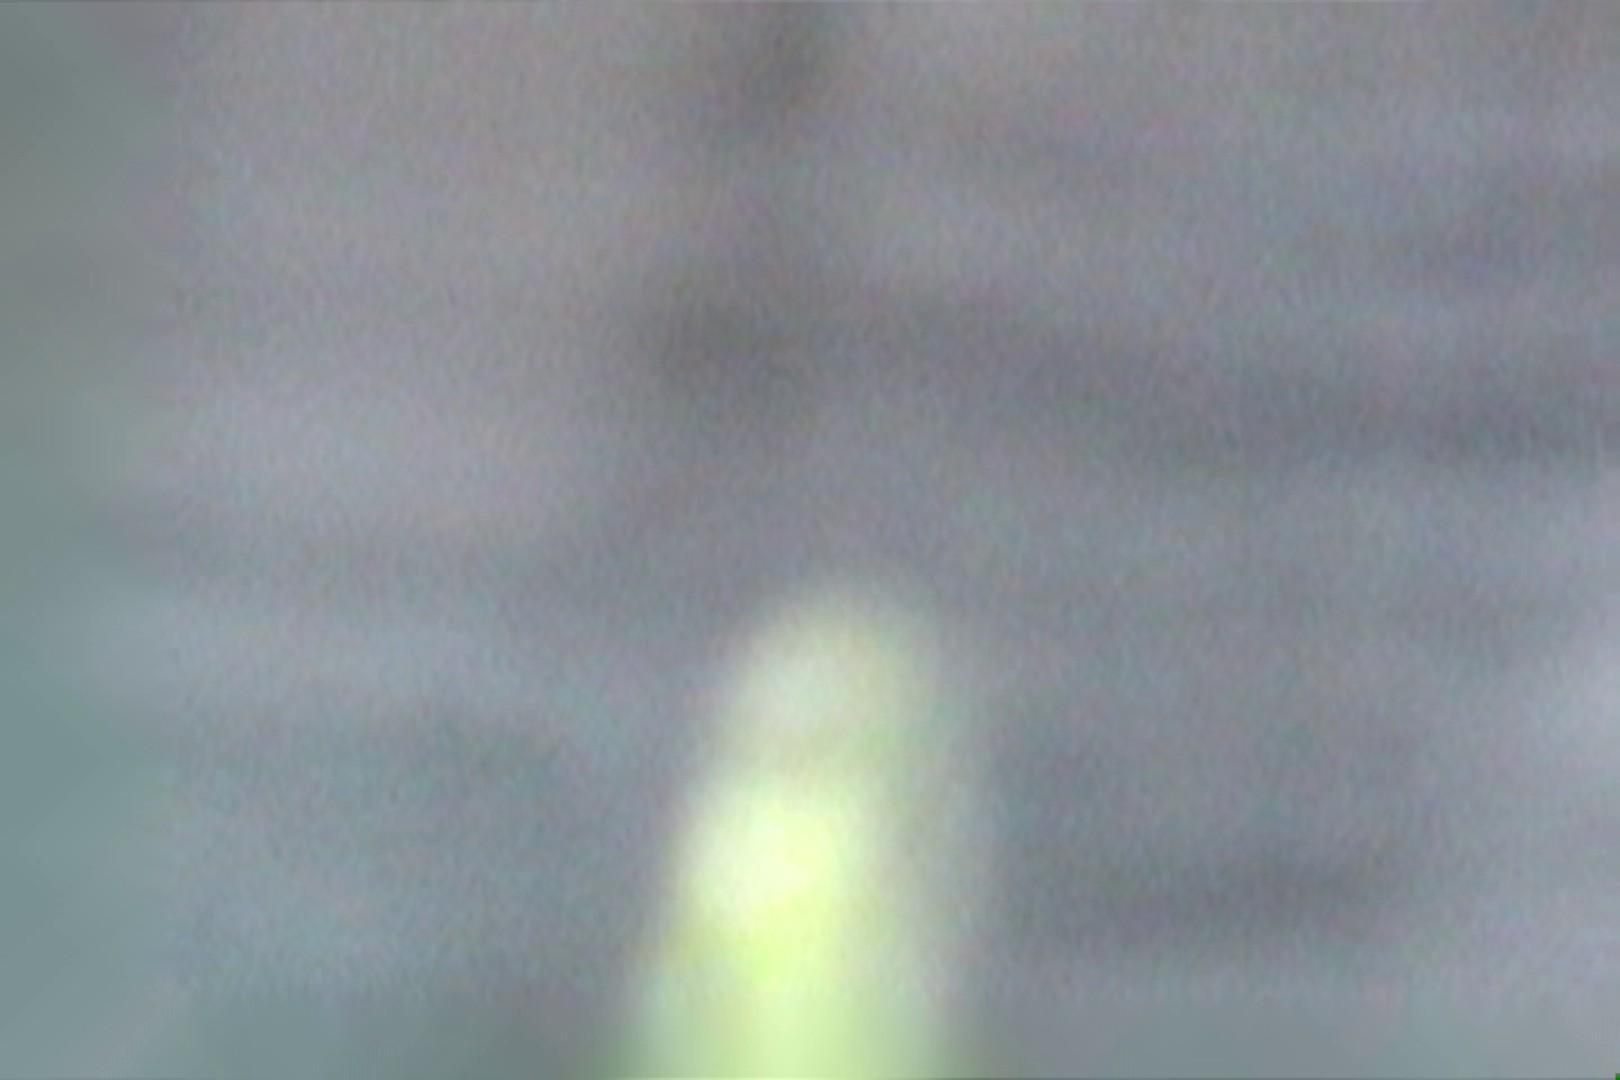 Aquaな露天風呂Vol.574 0 | 0  81連発 69